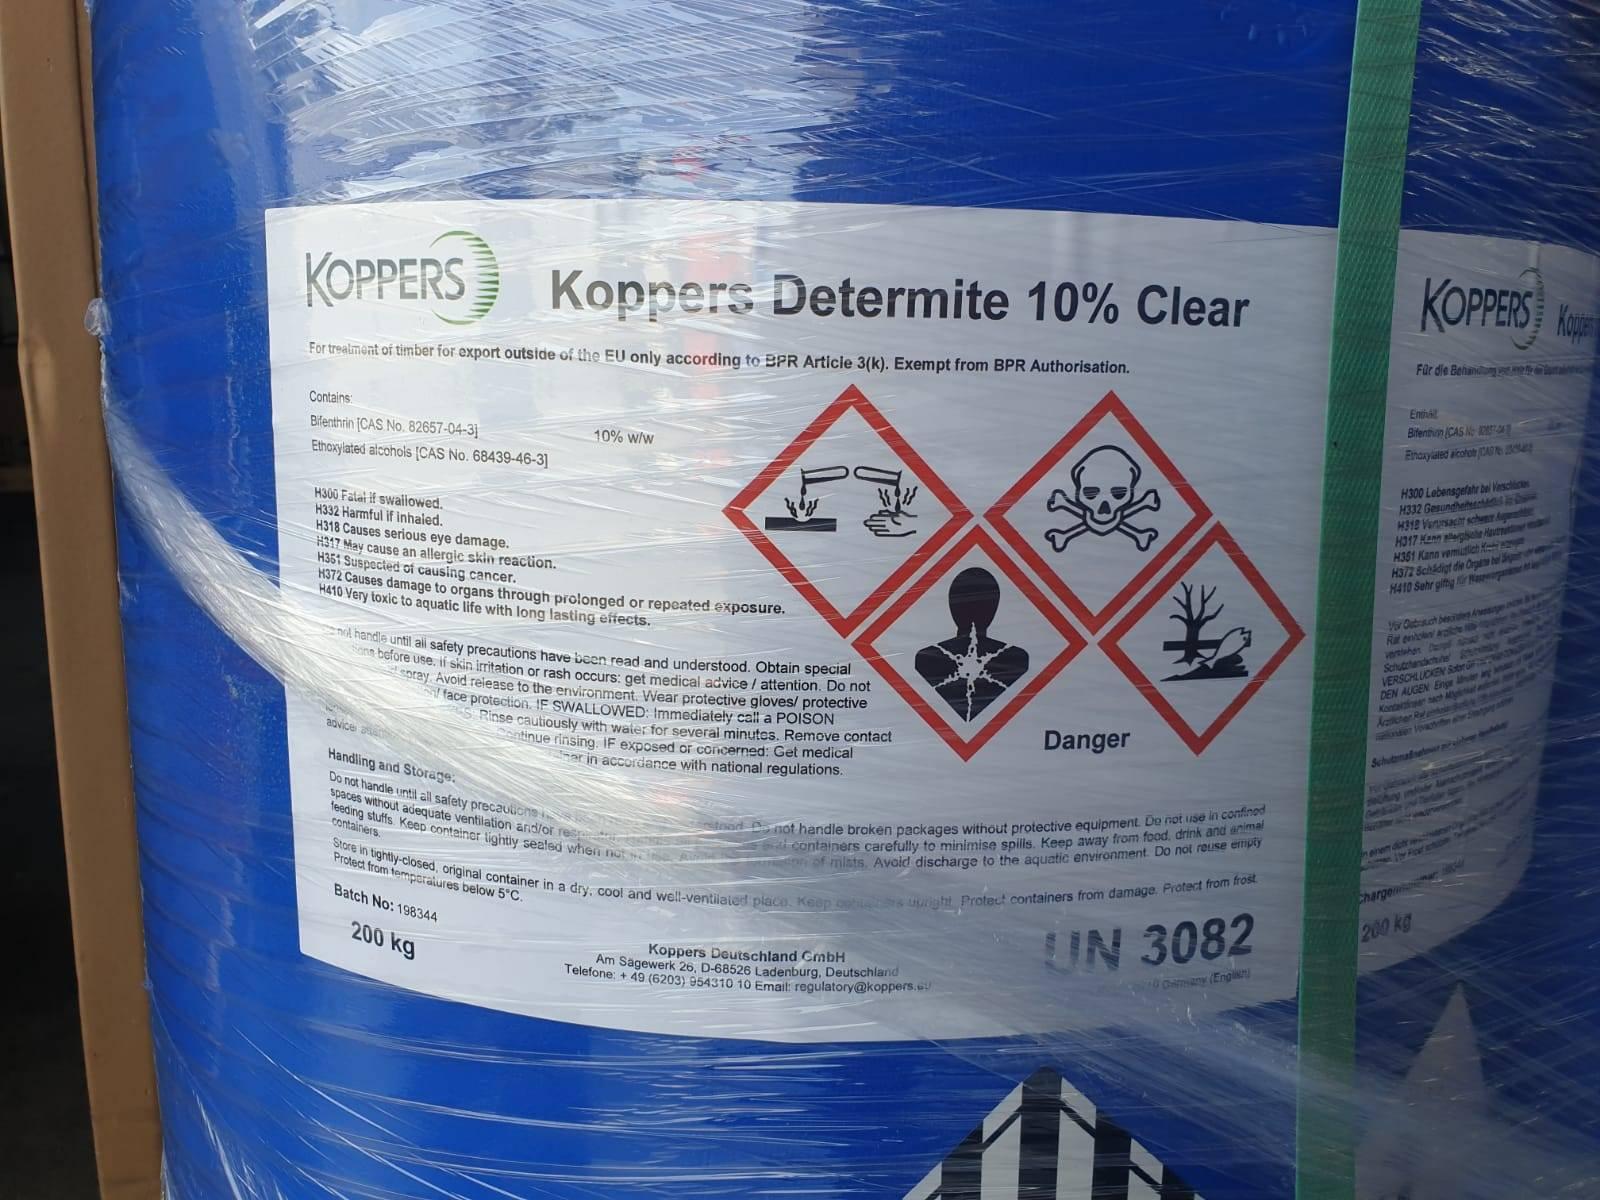 Koppers Determine Clear разработан для экспорта фанеры в Австралию